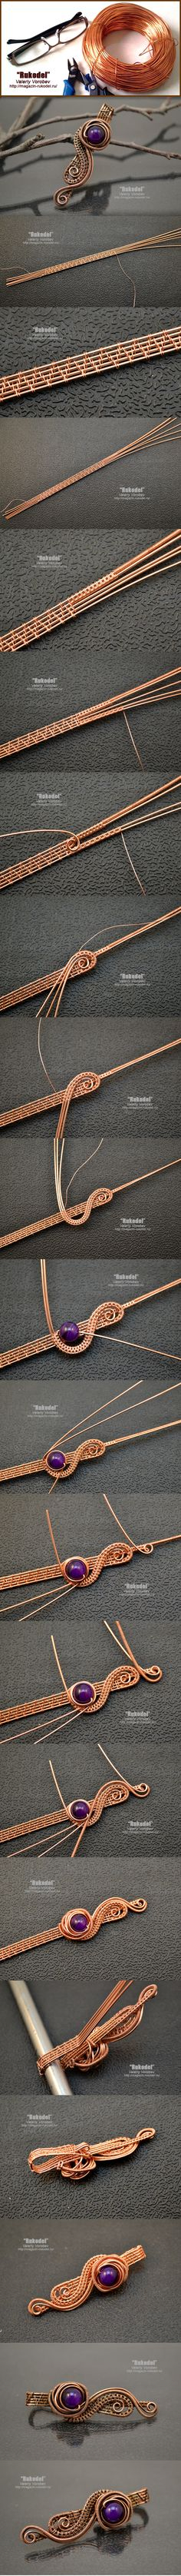 Wire Wrap Pendant - tutorial - magazin-rukodel.ru/